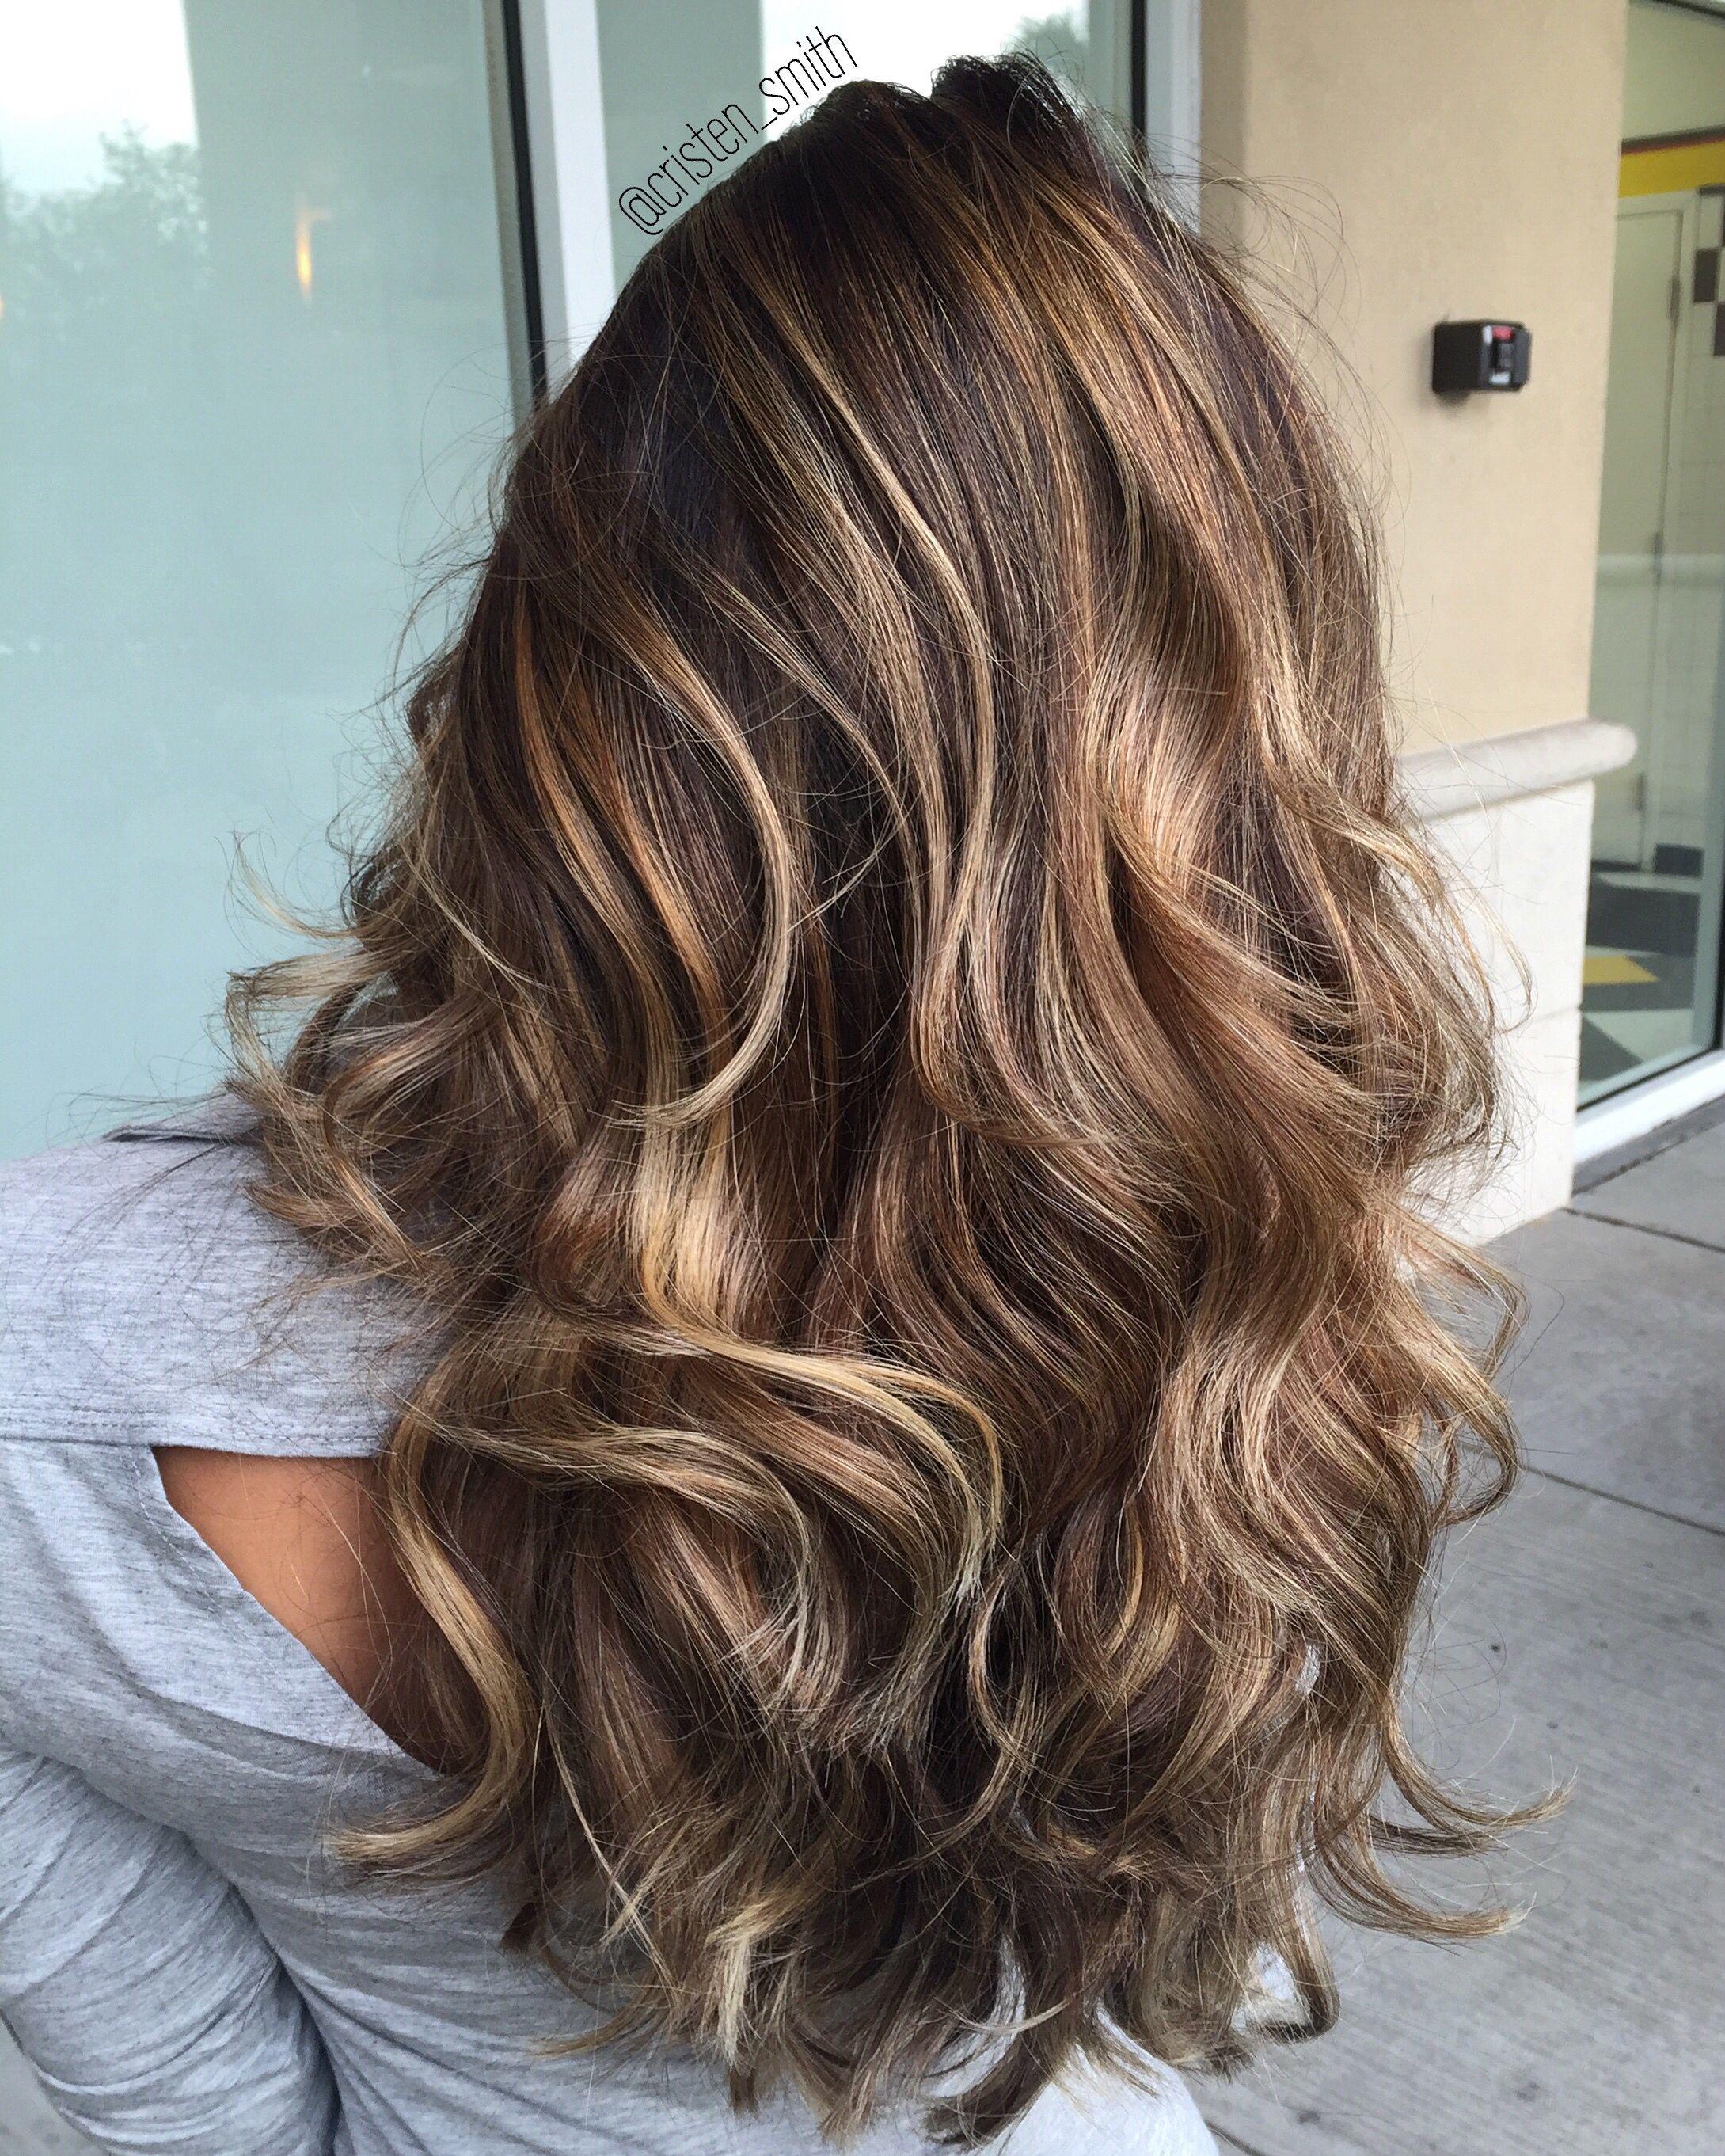 10 Awesome Long Haircut And Color Ideas 25 delightfully earthy fall hair color ideas my style hair 2020